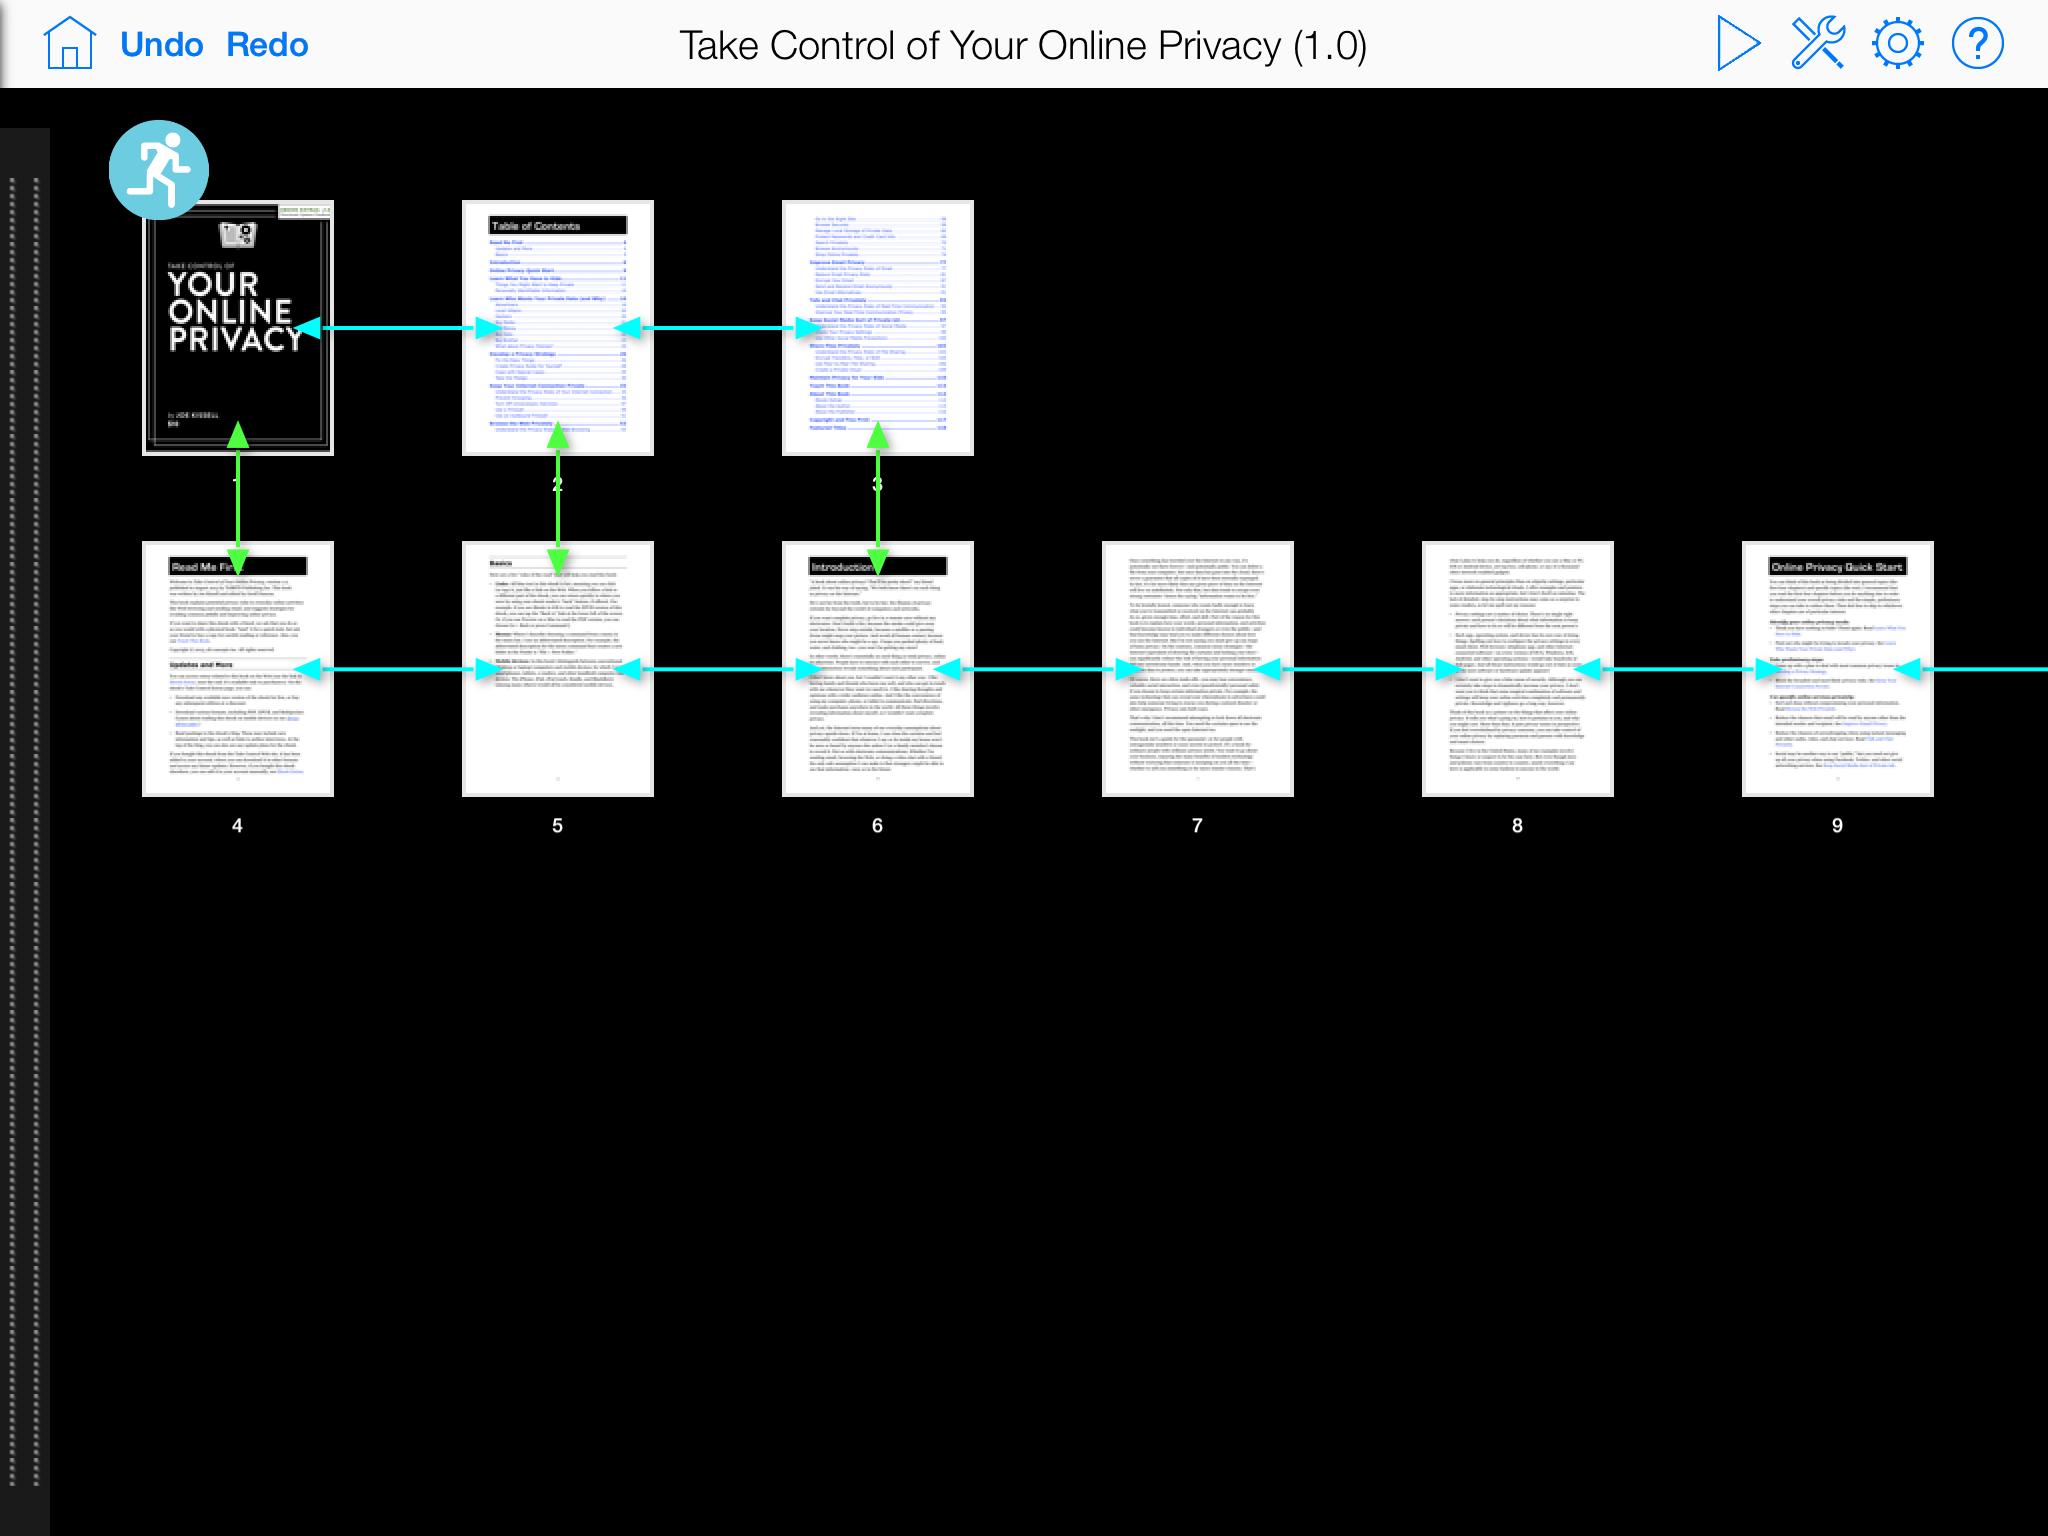 Online java tutorial choice image any tutorial examples core java video tutorial images any tutorial examples complete core java video tutorial free download free baditri Gallery